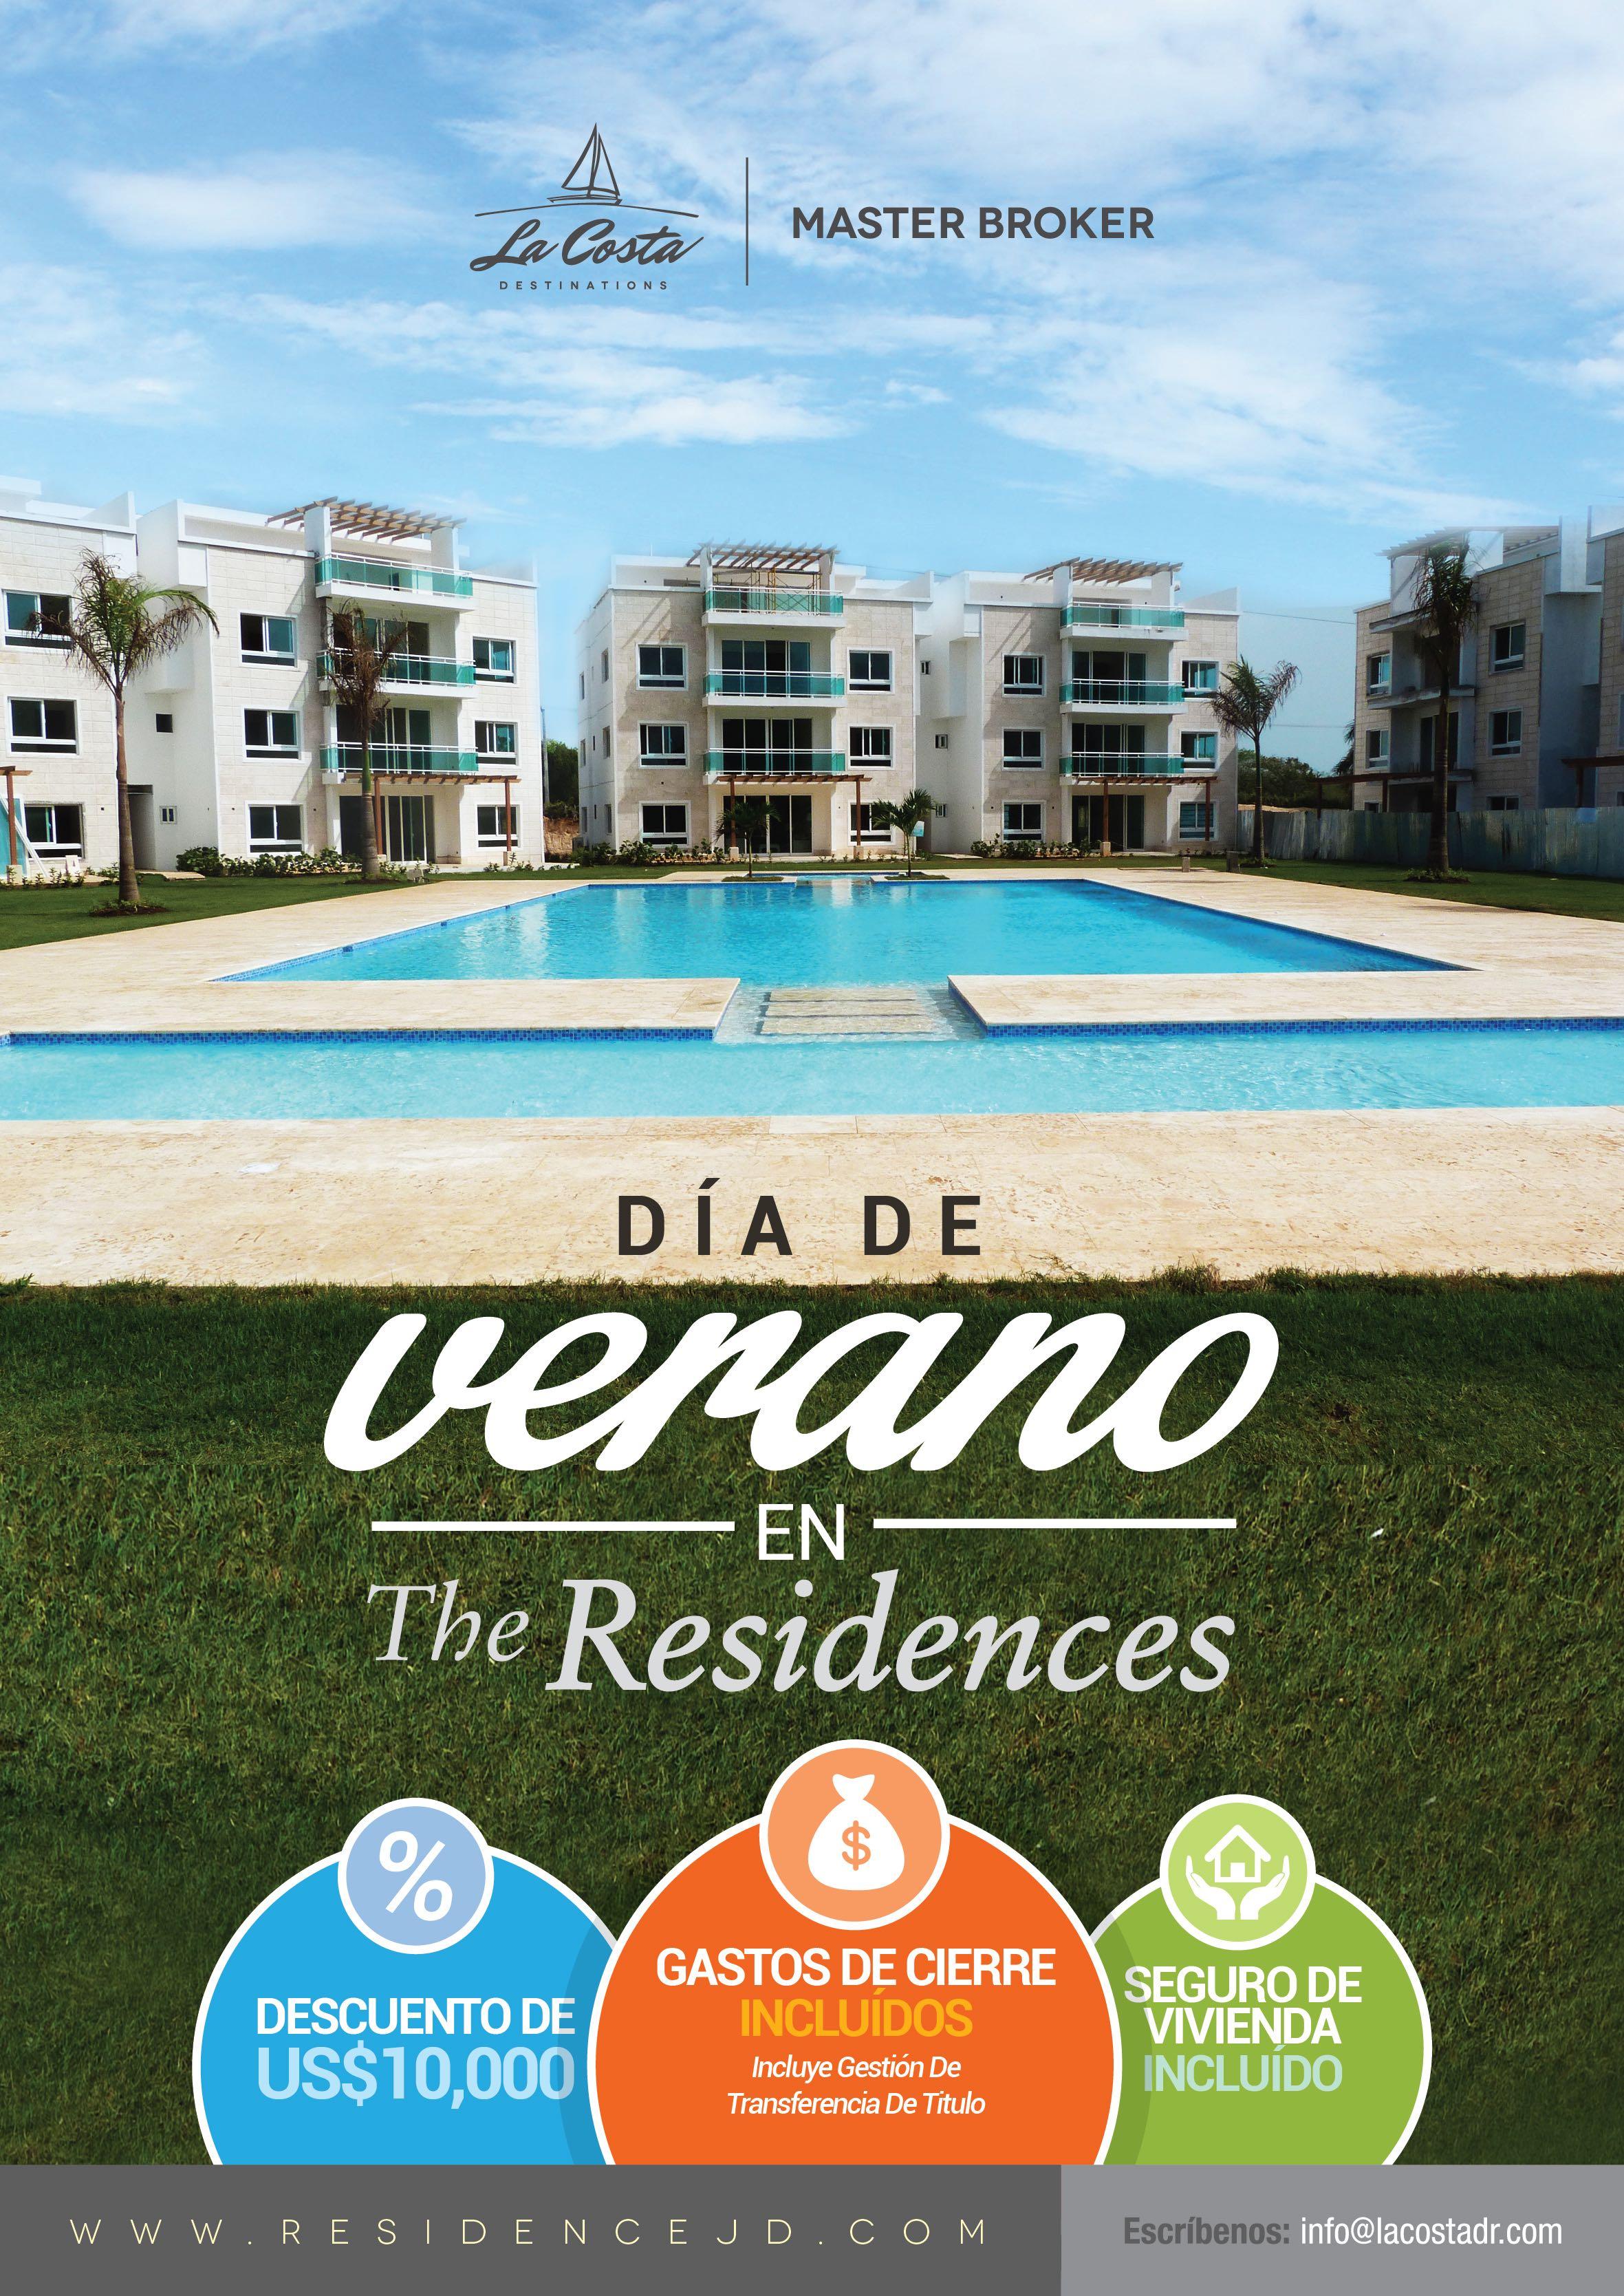 Arte_The_Residences_Promoci_n_Verano-01.jpg